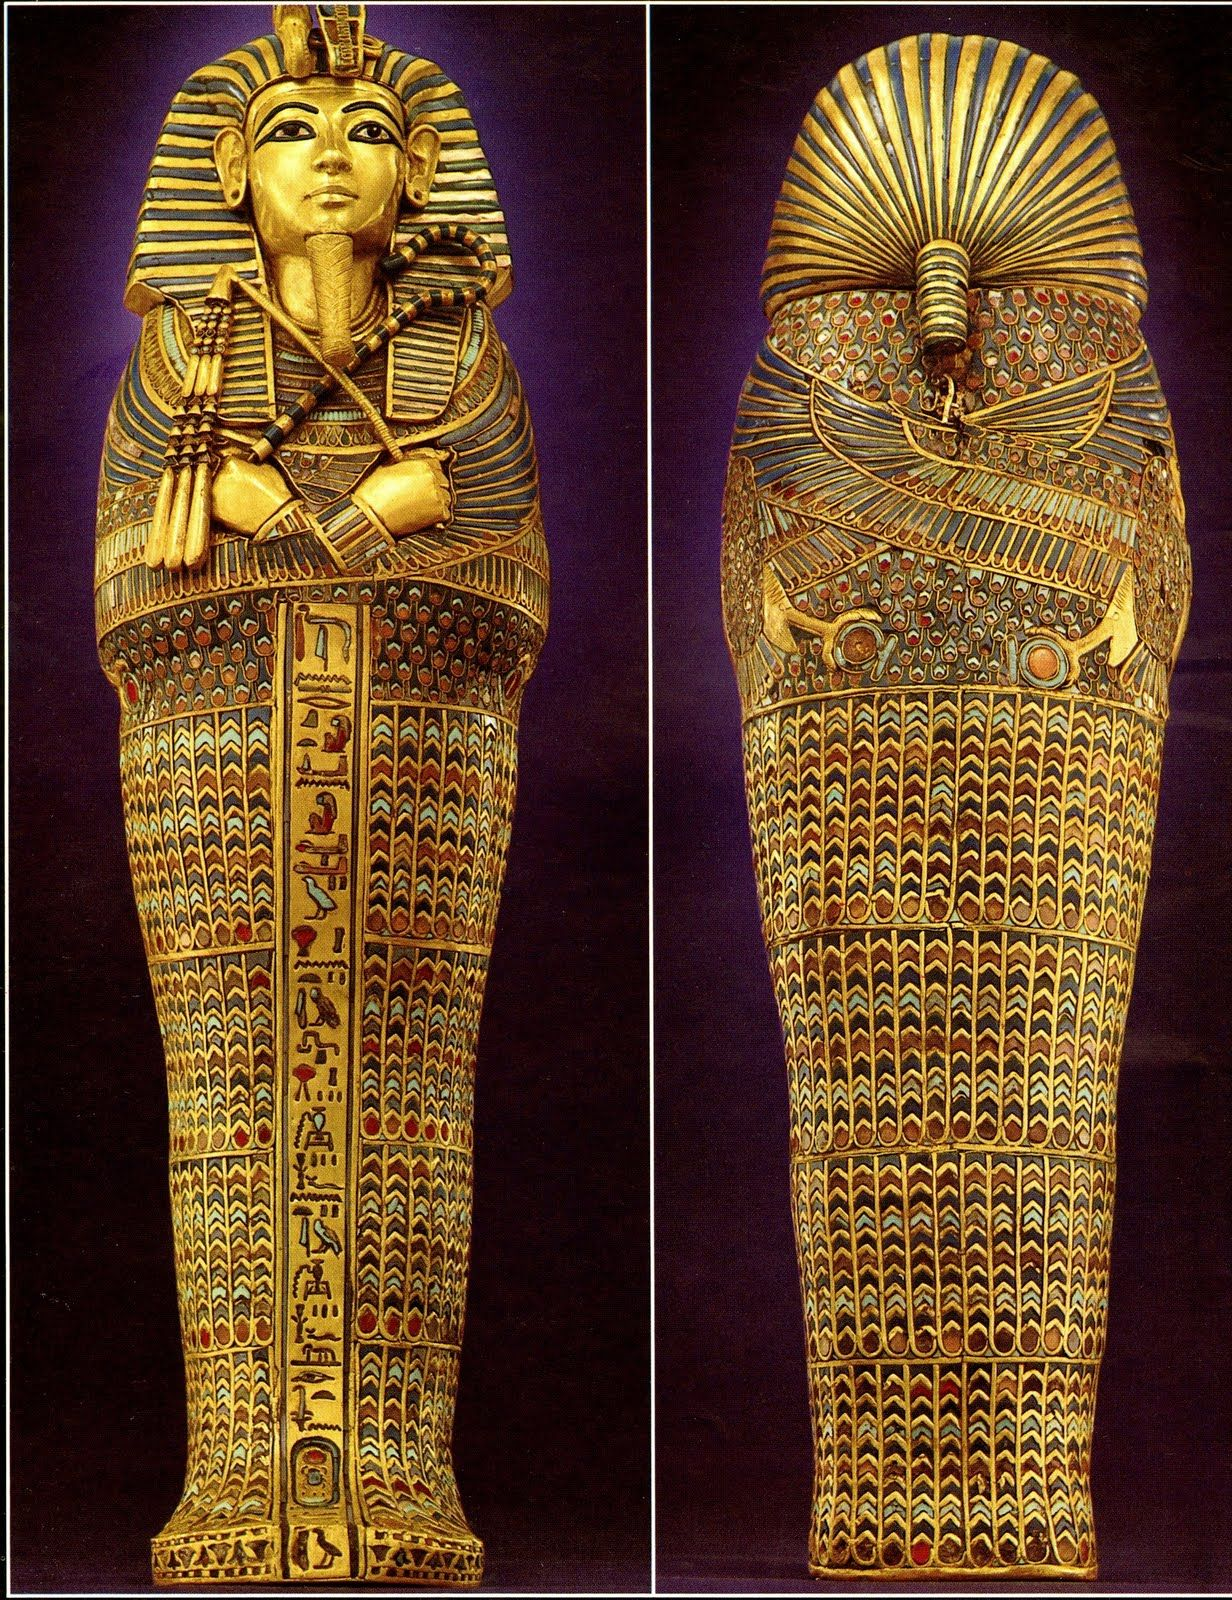 king tut sarcophagus cityzenart king tutankhamuns tomb and king tut sarcophagus cityzenart king tutankhamuns tomb and treasures